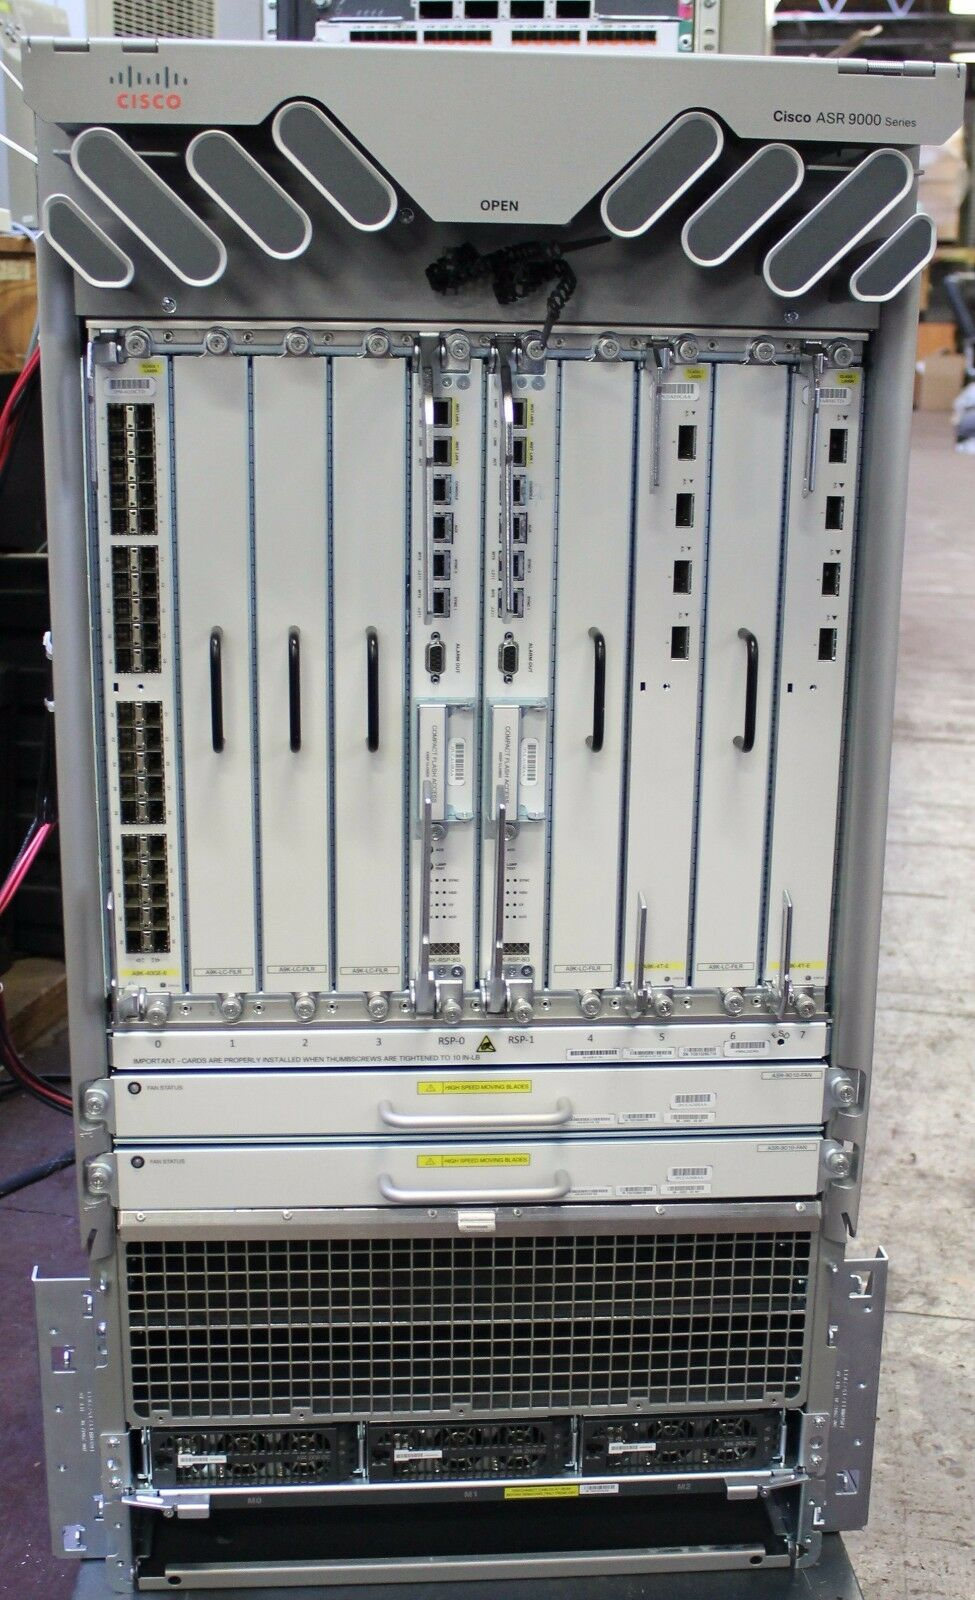 Cisco ASR 9000 Series Asr-9010 Router Mfg 2013